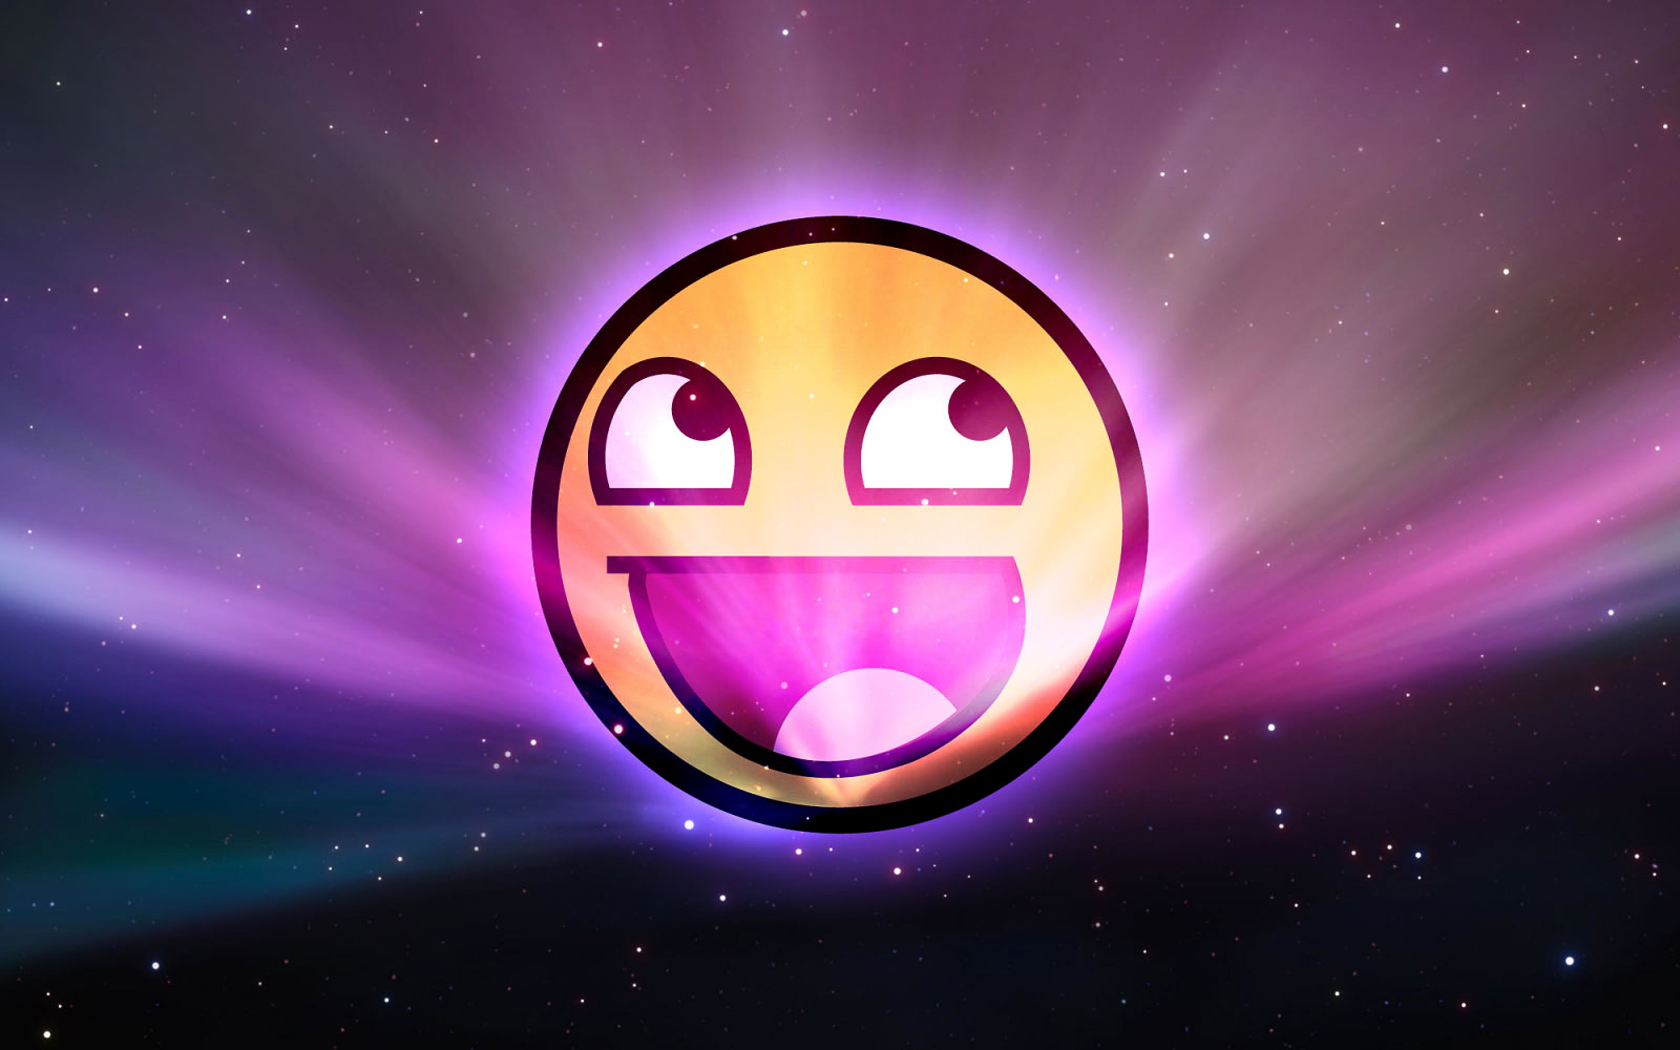 الابتسامة (3)